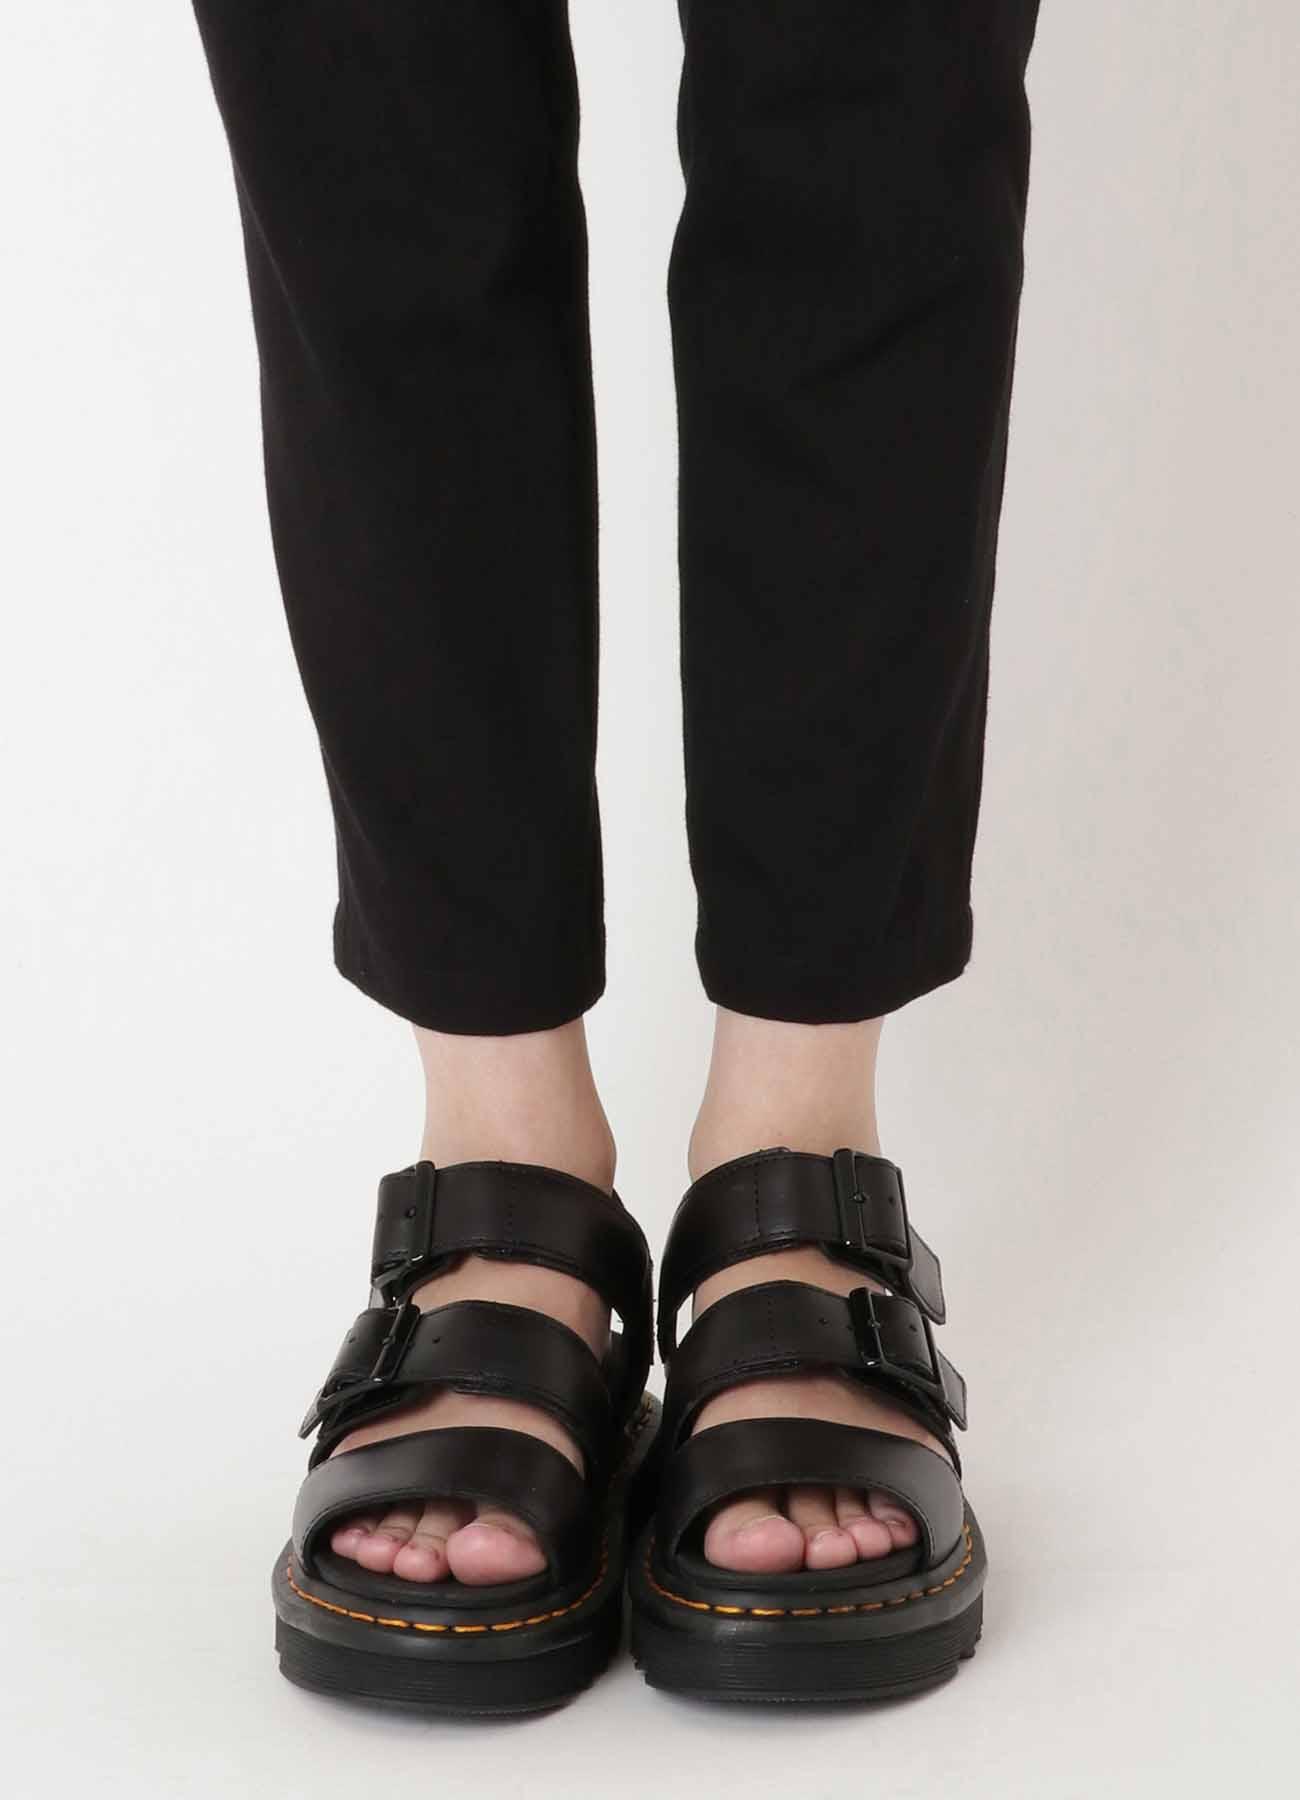 UNEVEN SOFT TWILL SIDE STRIPE SKINNY PANTS